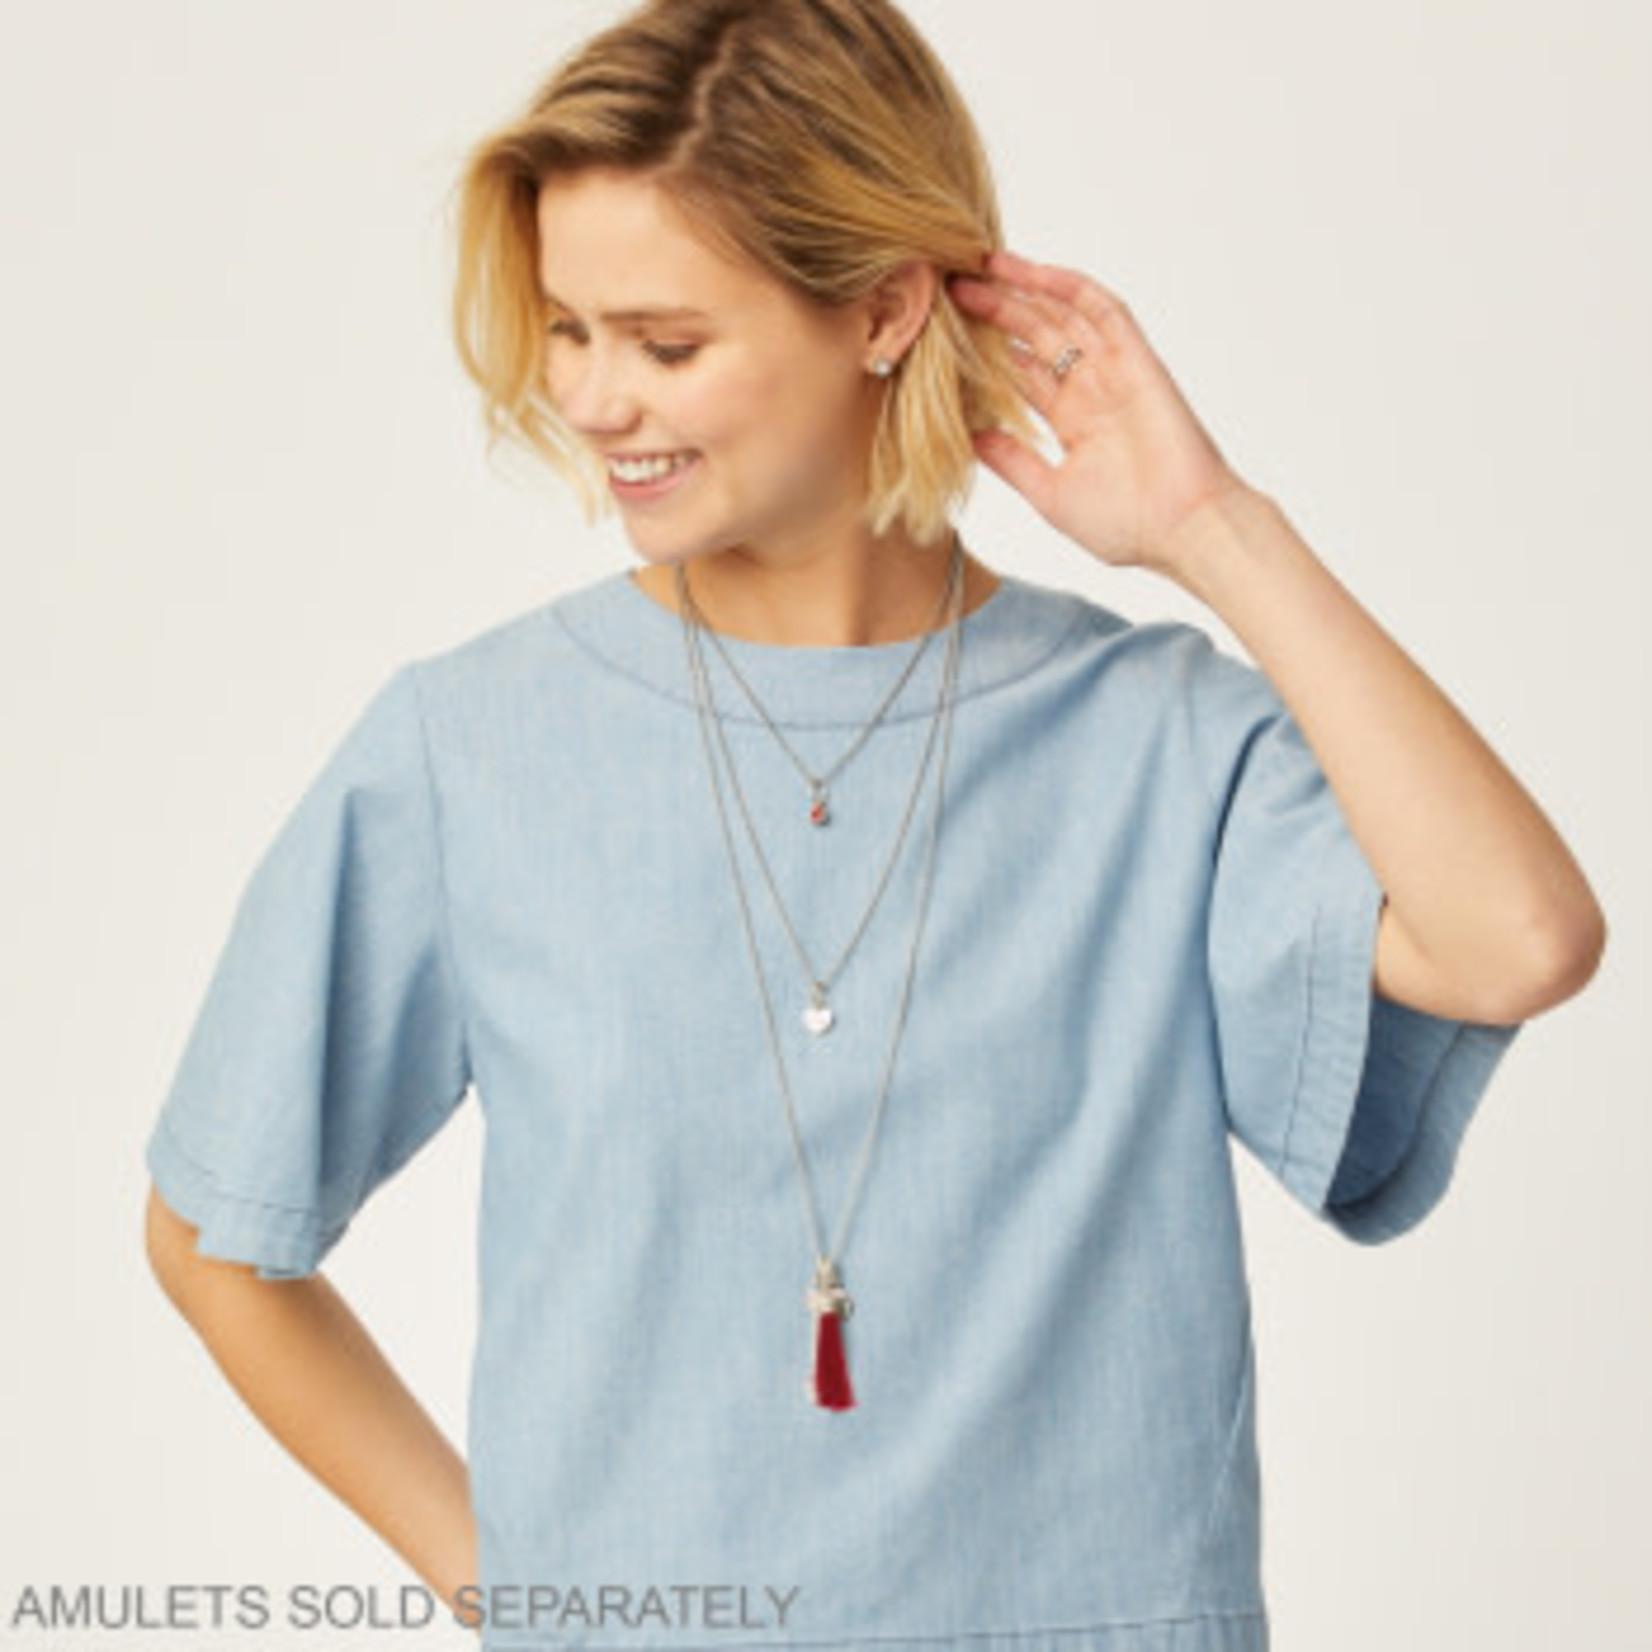 Brighton Vivi Delicate Short Charm Necklace